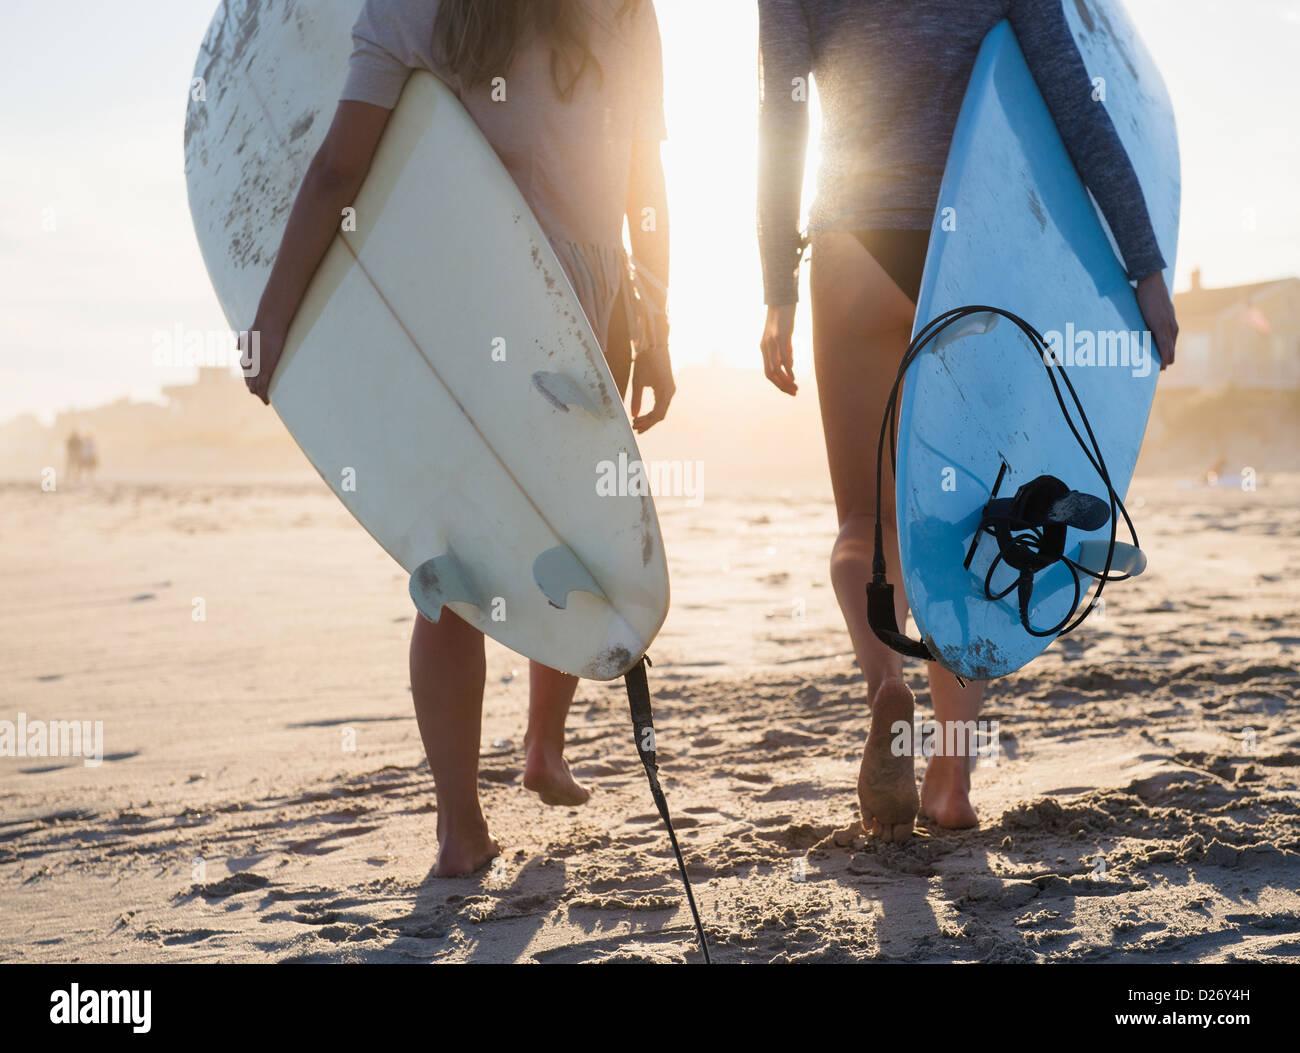 USA, New York State, Rockaway Beach, deux femmes surfers walking on beach Photo Stock